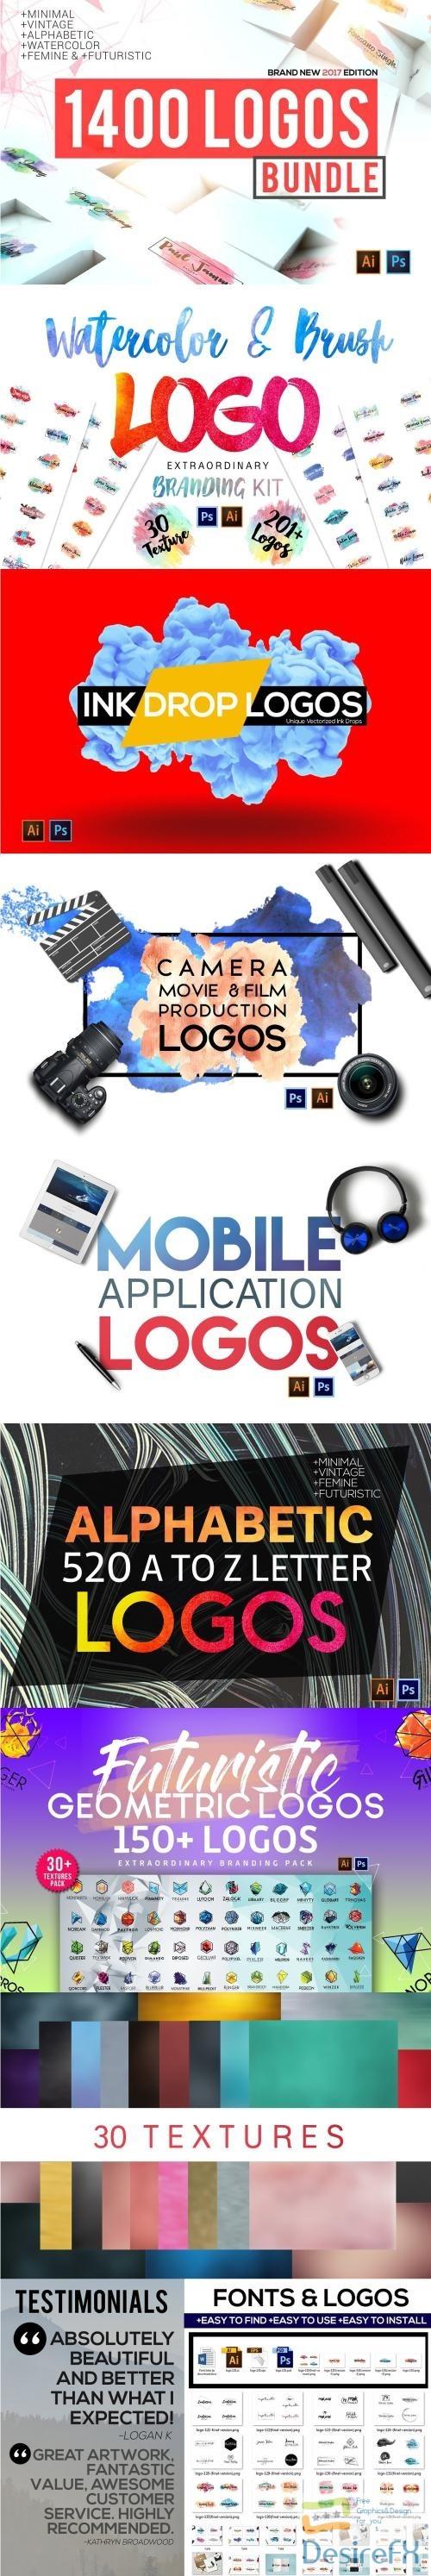 photoshop - 1400 Logos Mega Bundle Pack - 1312306